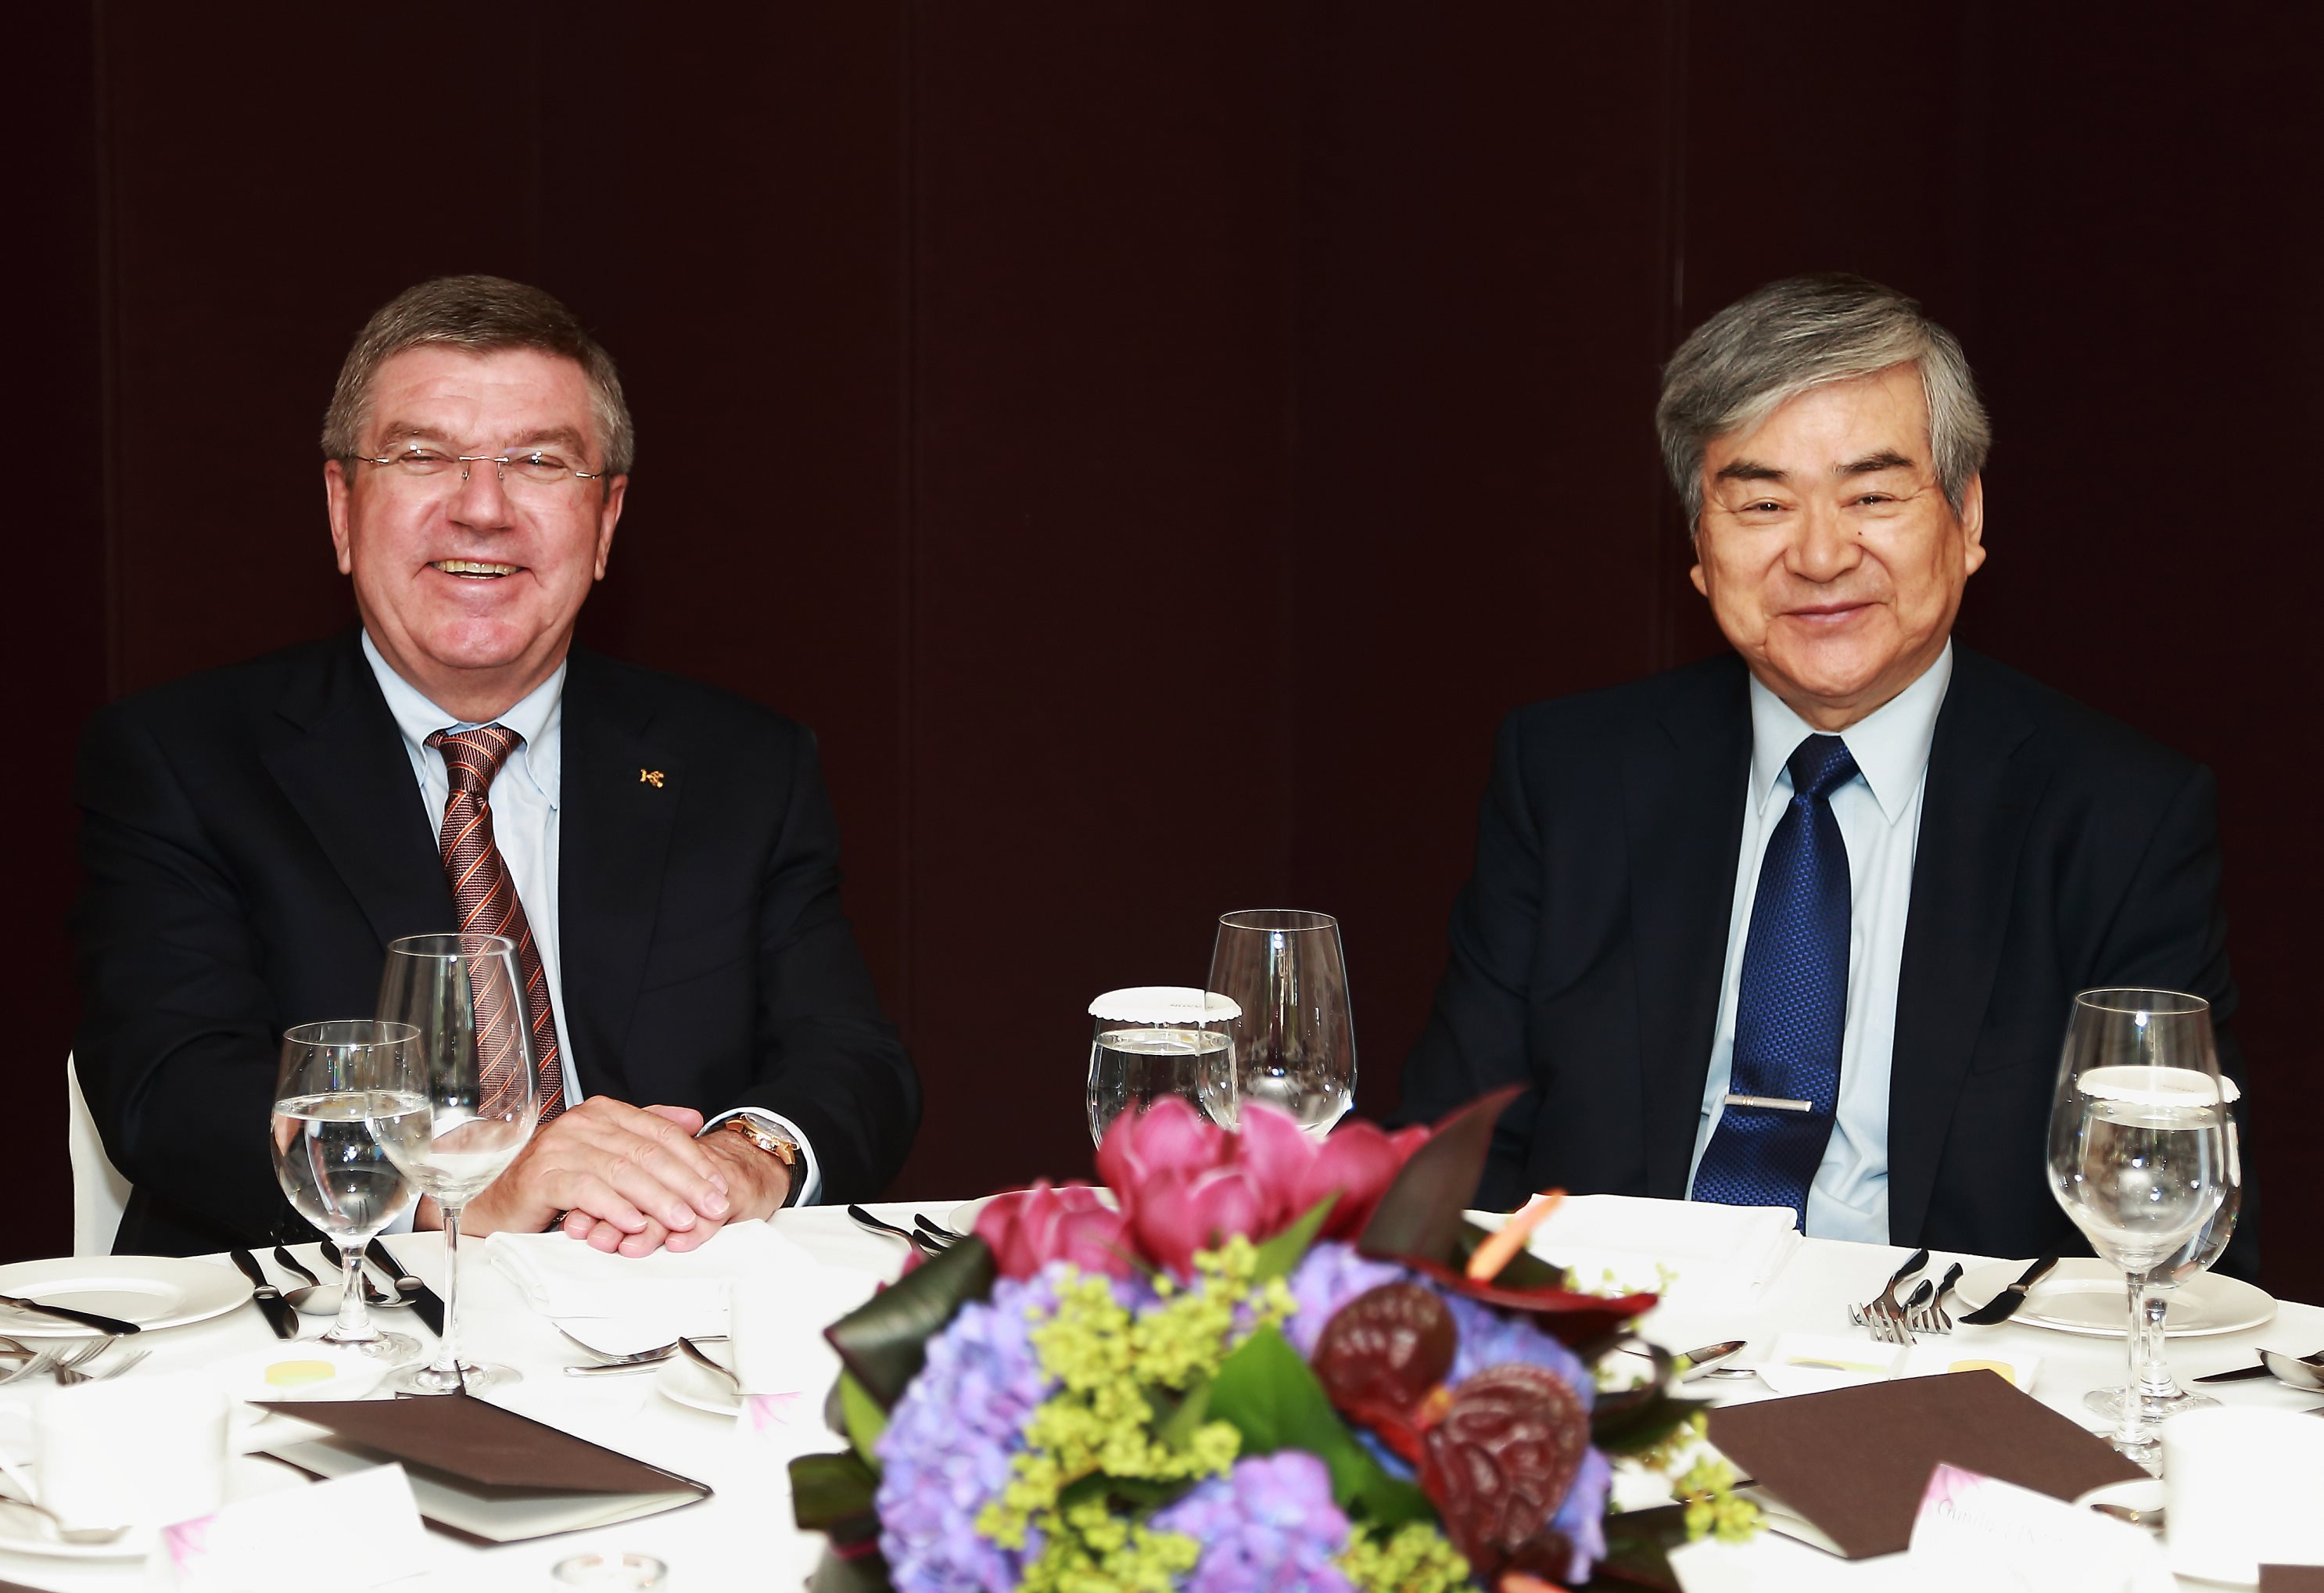 International Olympic Committee President Thomas Bach was among those to welcome the return of Cho Yang Ho as head of Pyeongchang 2018 ©Pyeongchang 2018